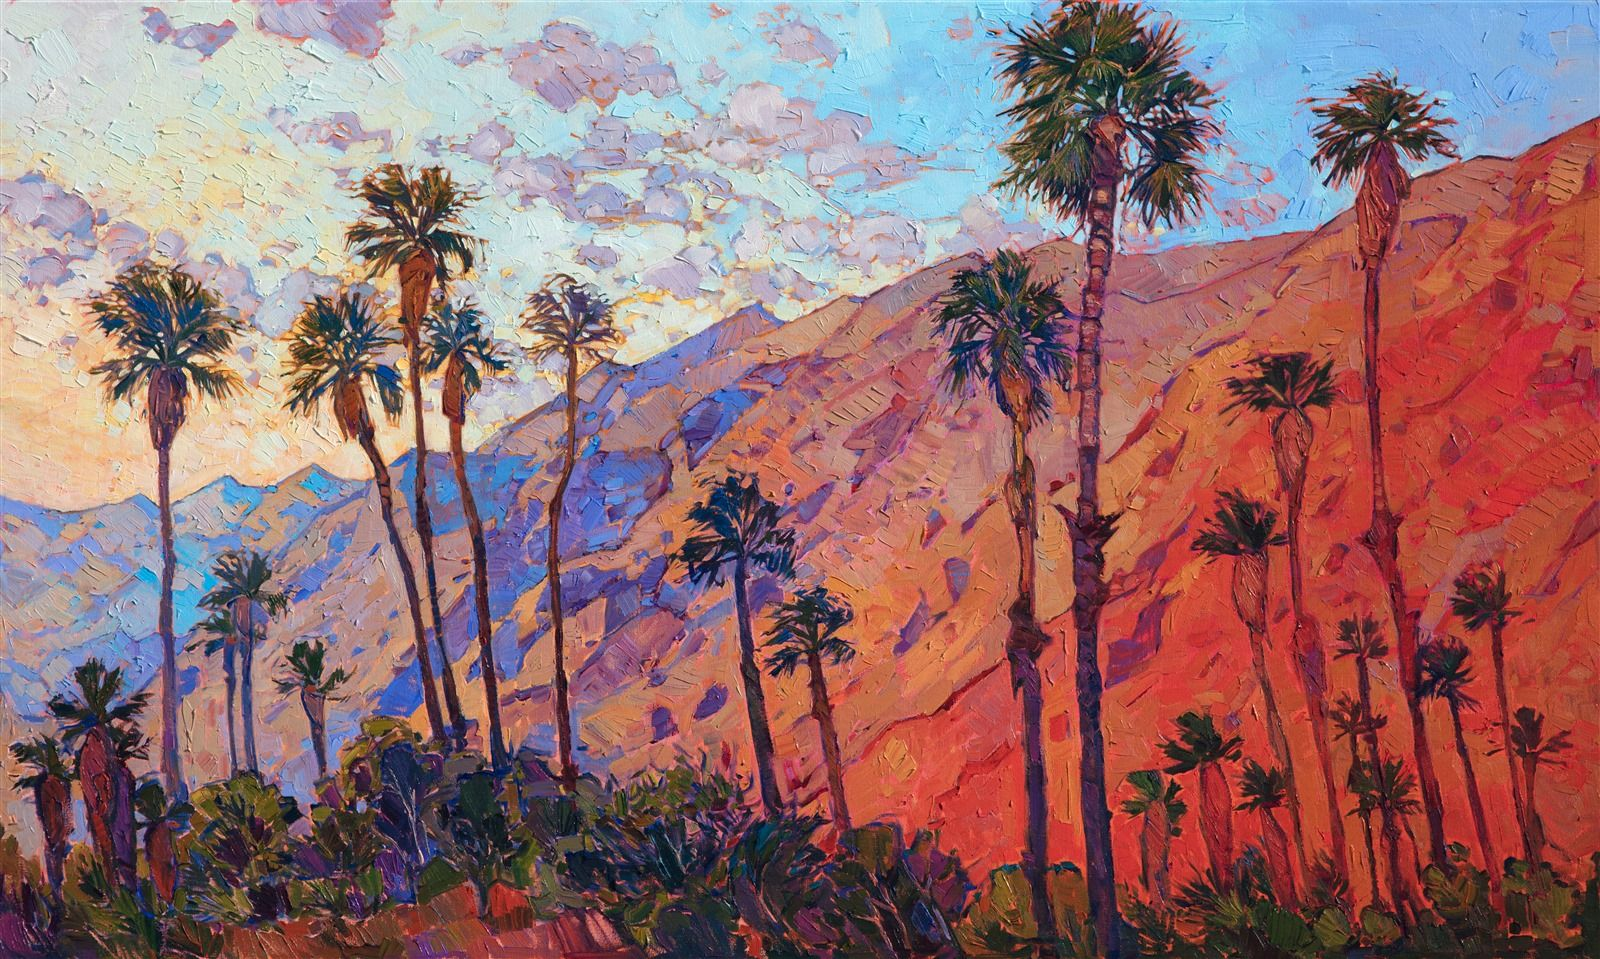 Santa Rosa By Erin Hanson With Images Fine Art Landscape Fine Art Prints Artists Art Festival Poster